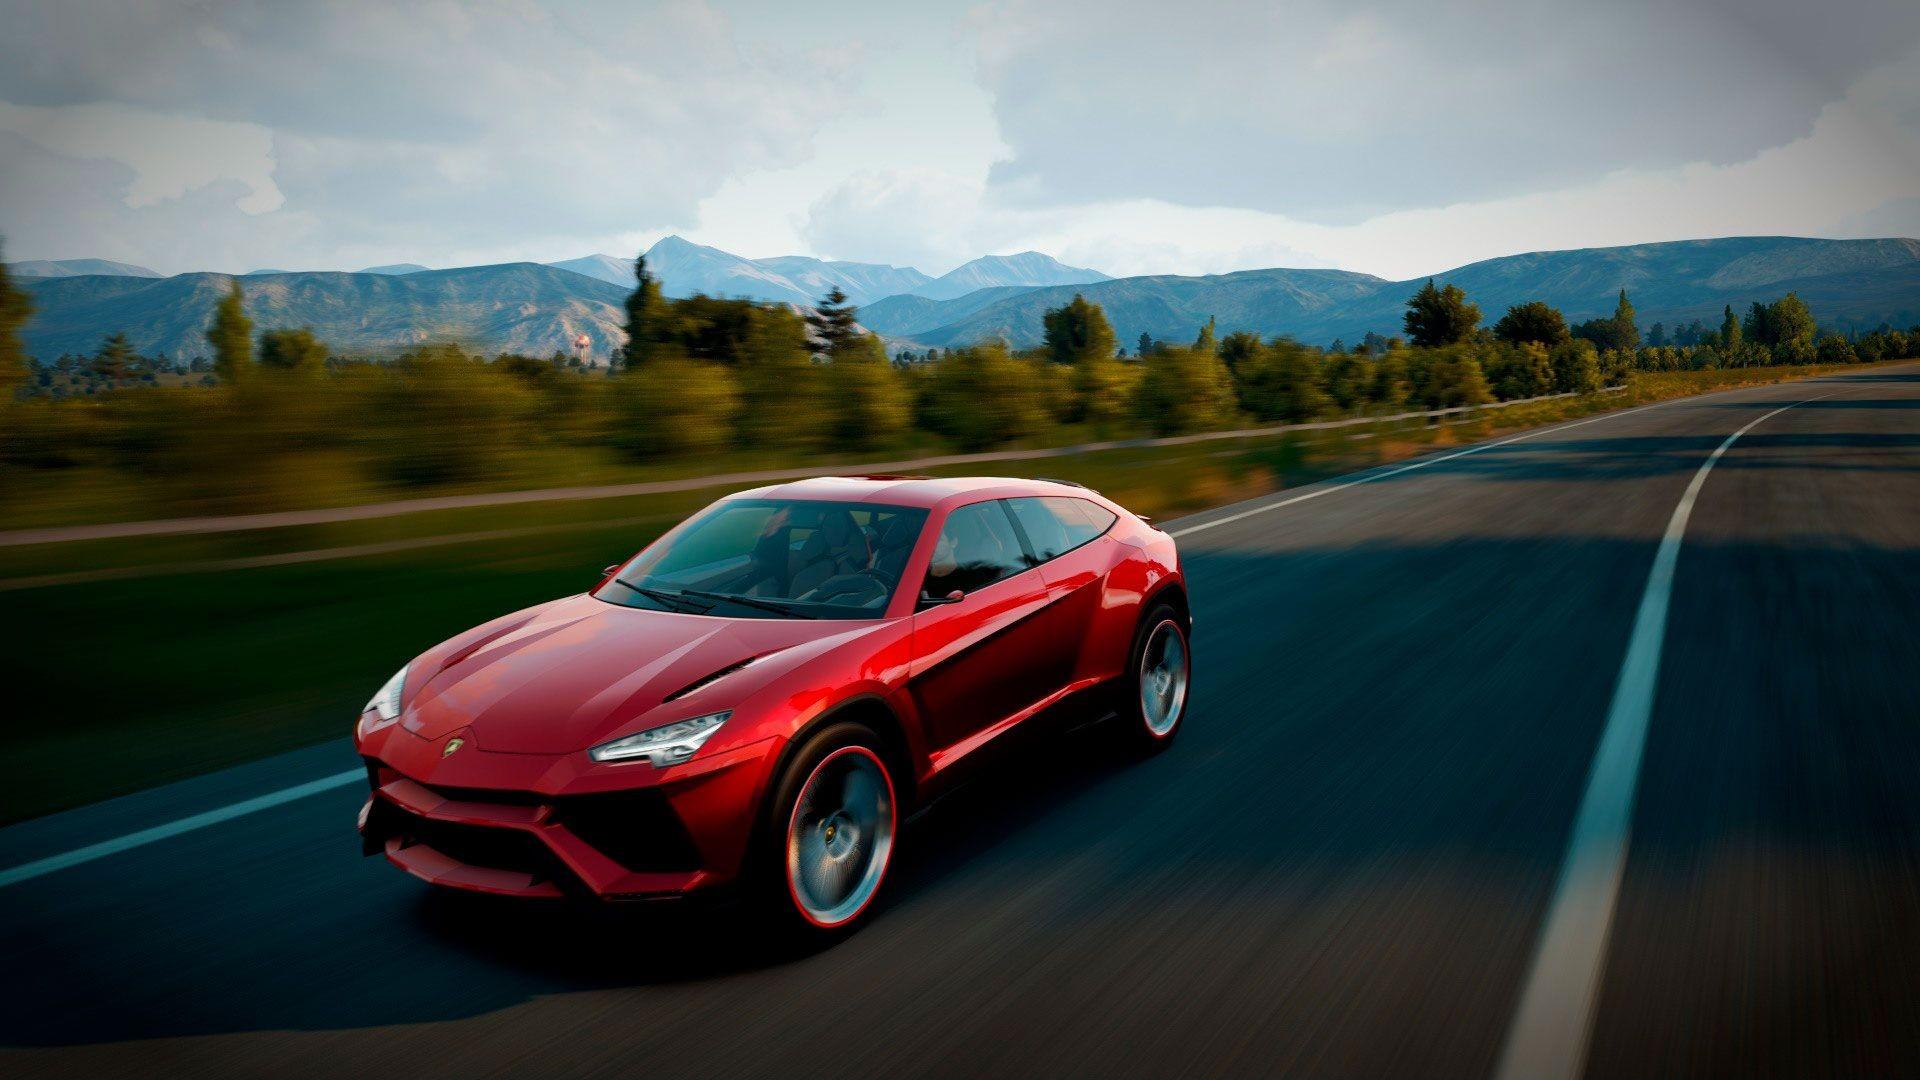 Lamborghini Veneno Wallpaper ·① Download Free Awesome Full